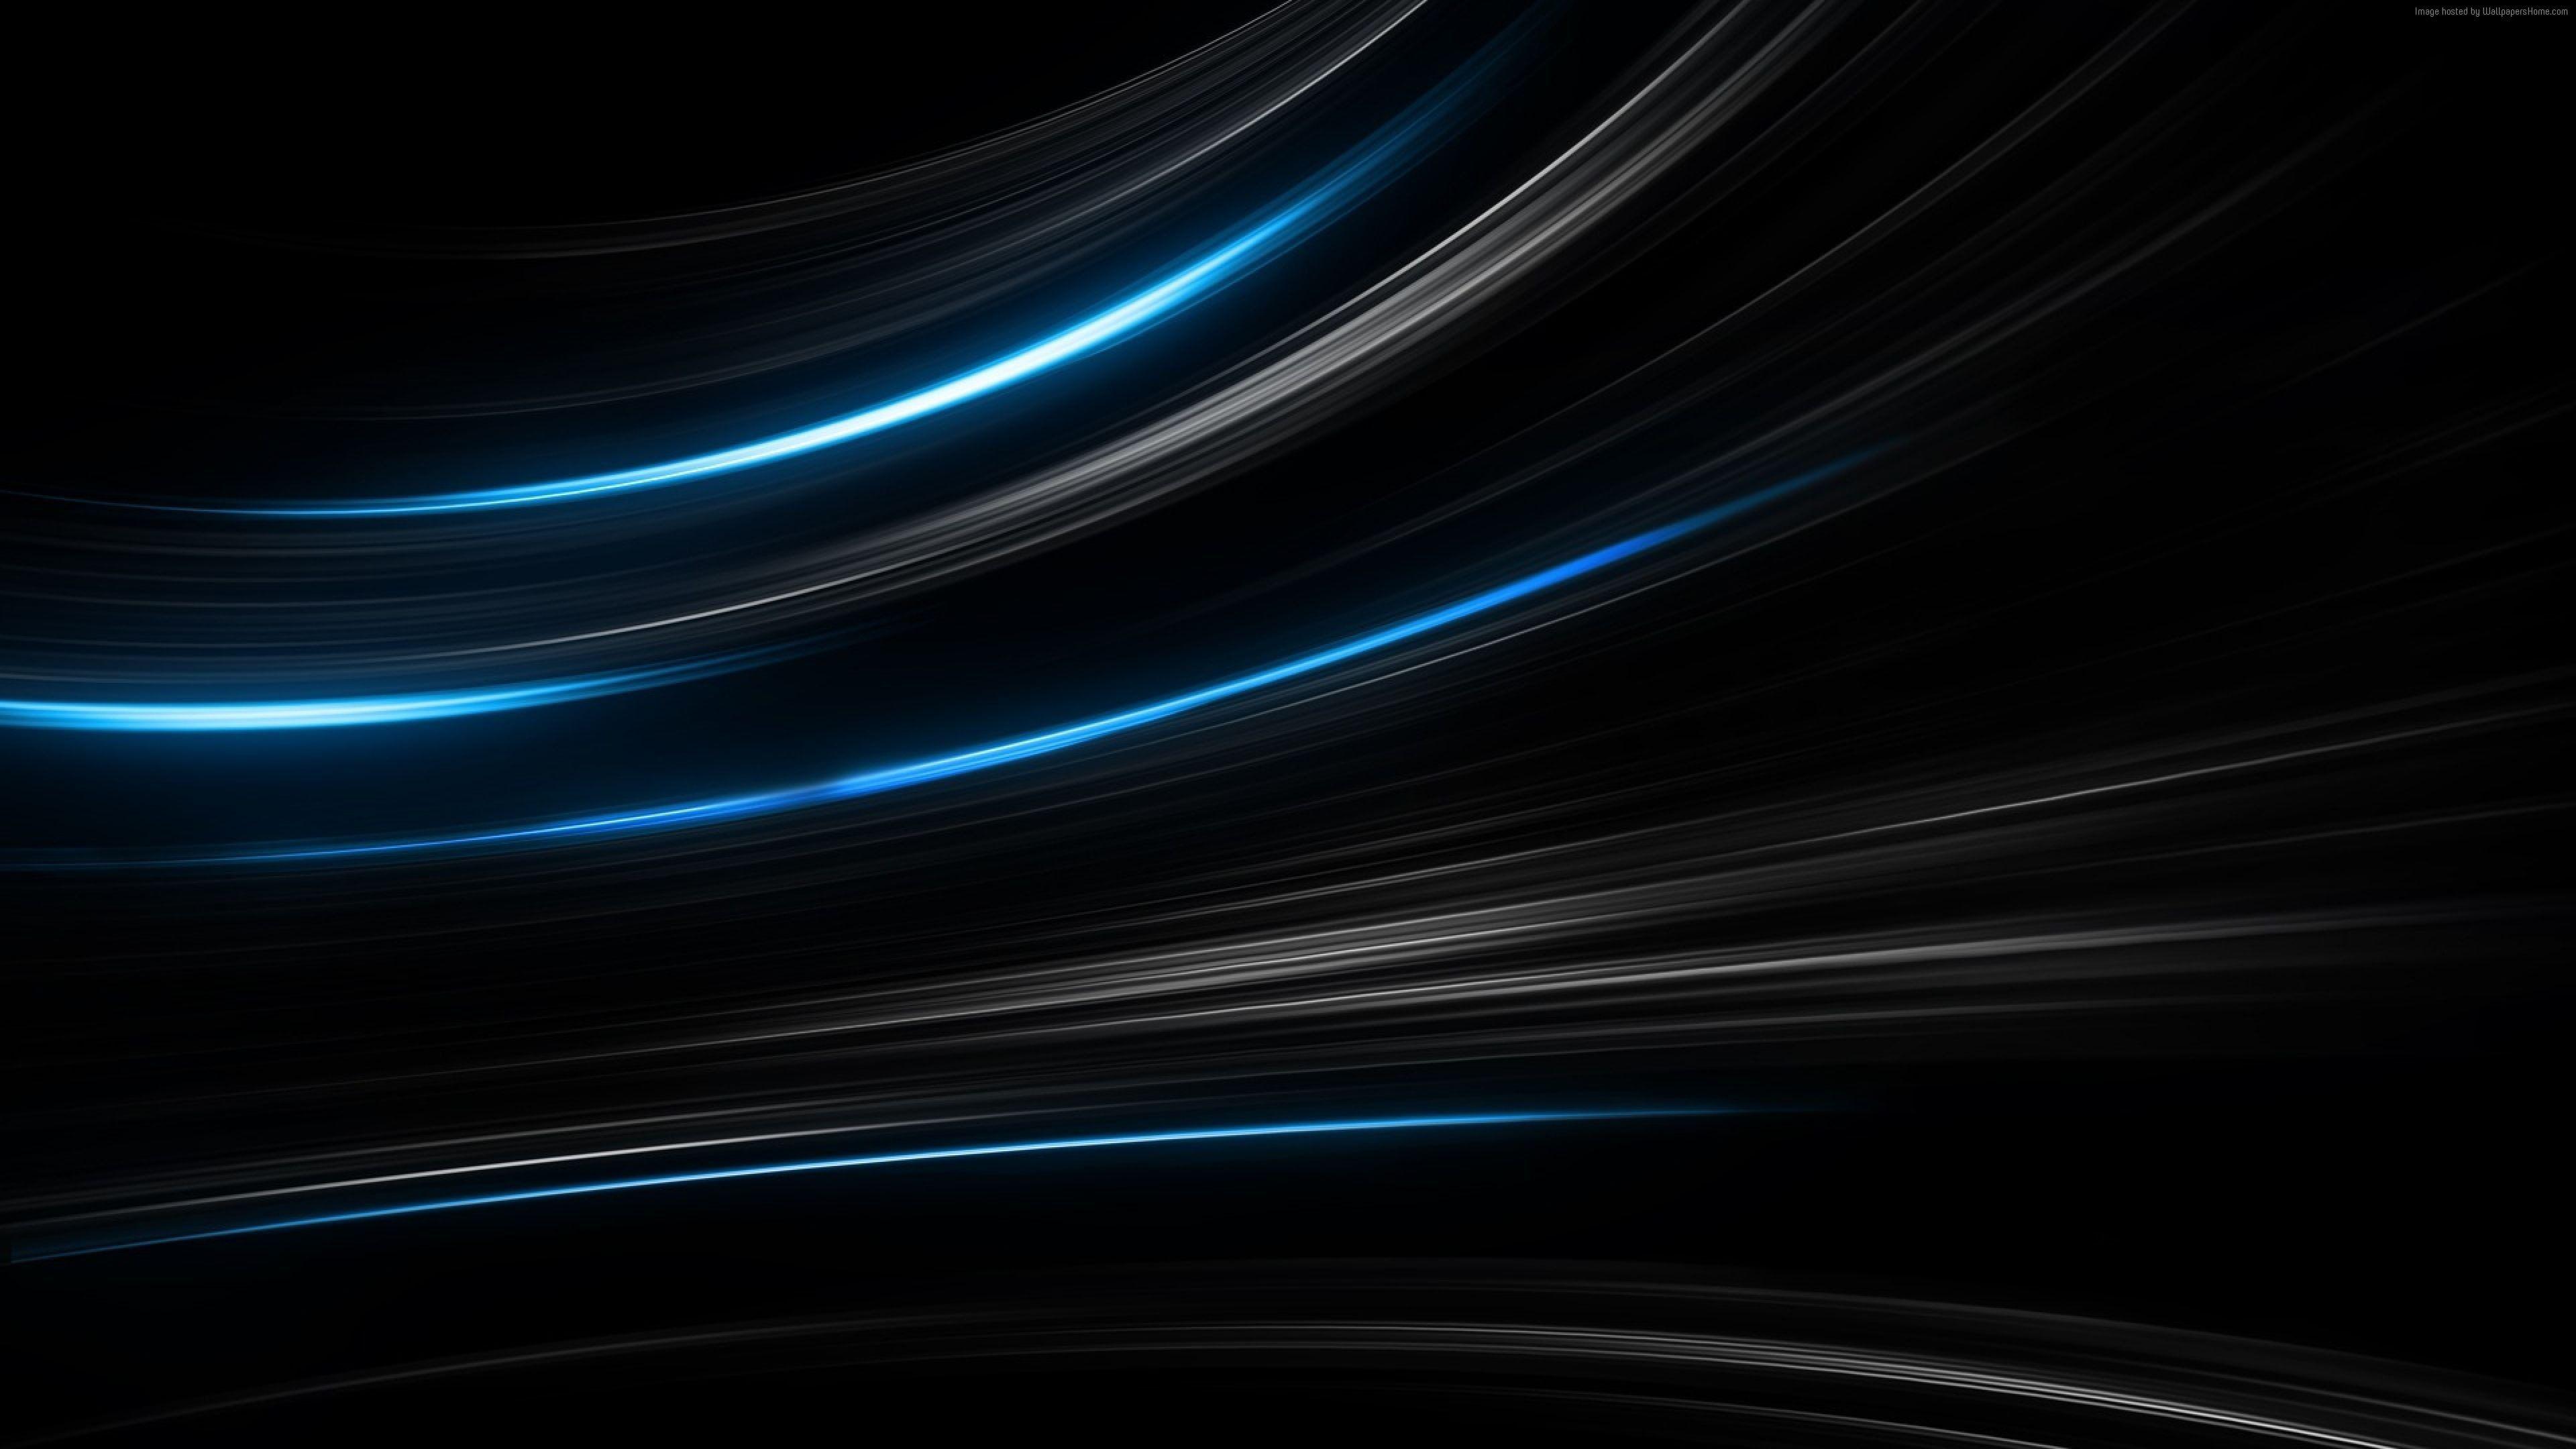 Black 4k Blue Lines 4k Wallpaper Hdwallpaper Desktop Black And Blue Wallpaper Dark Blue Wallpaper Abstract Wallpaper